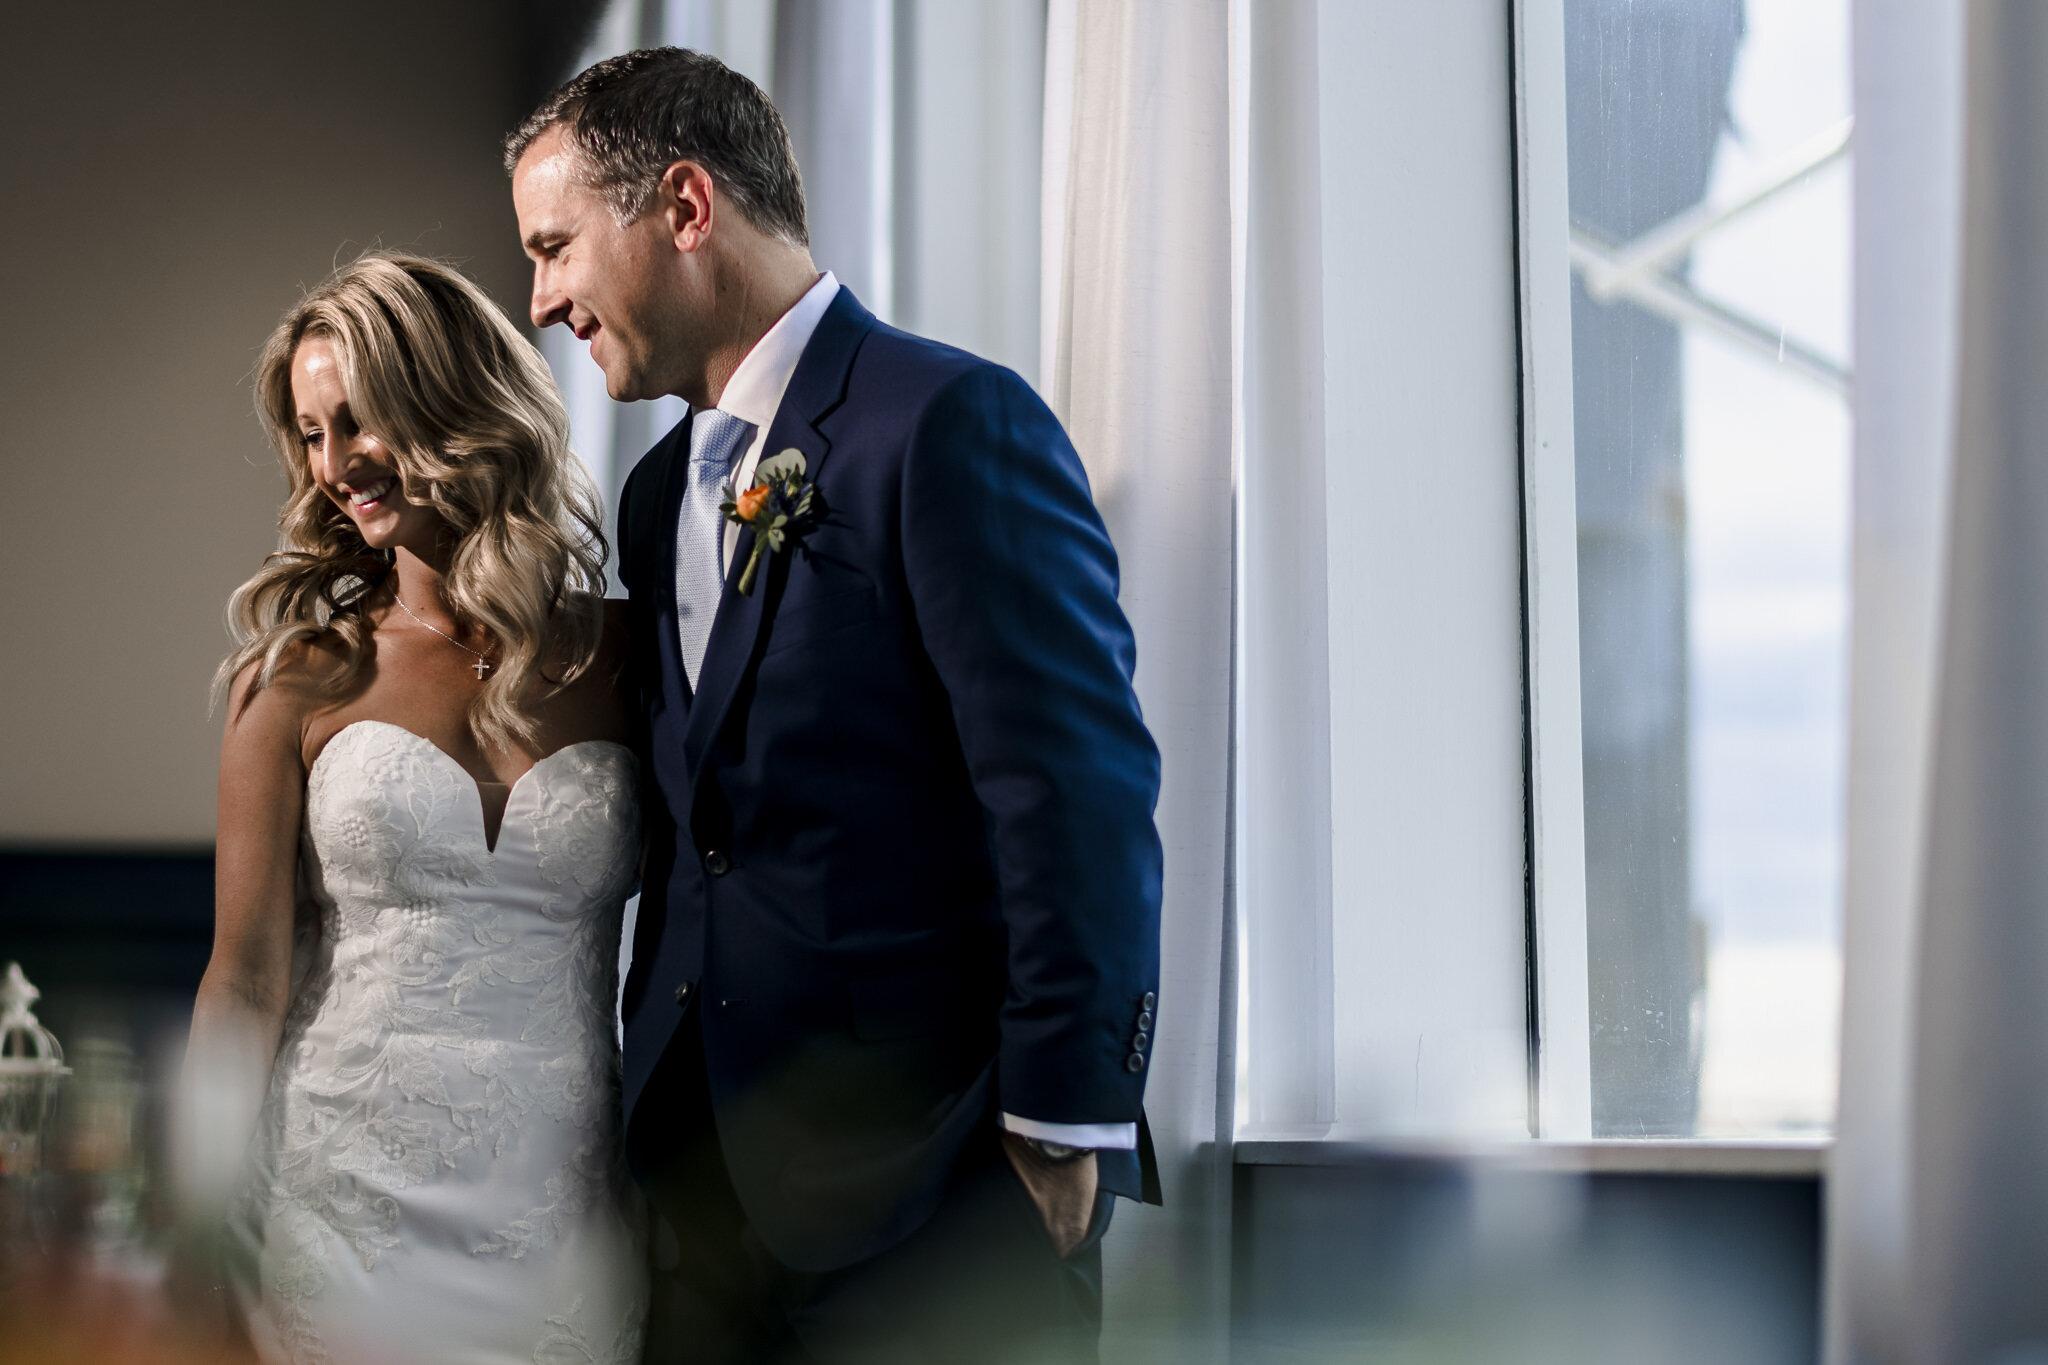 Snell-Ocean-City-Yacht-Club-New-Jersey-Wedding-Photographer-14.JPG